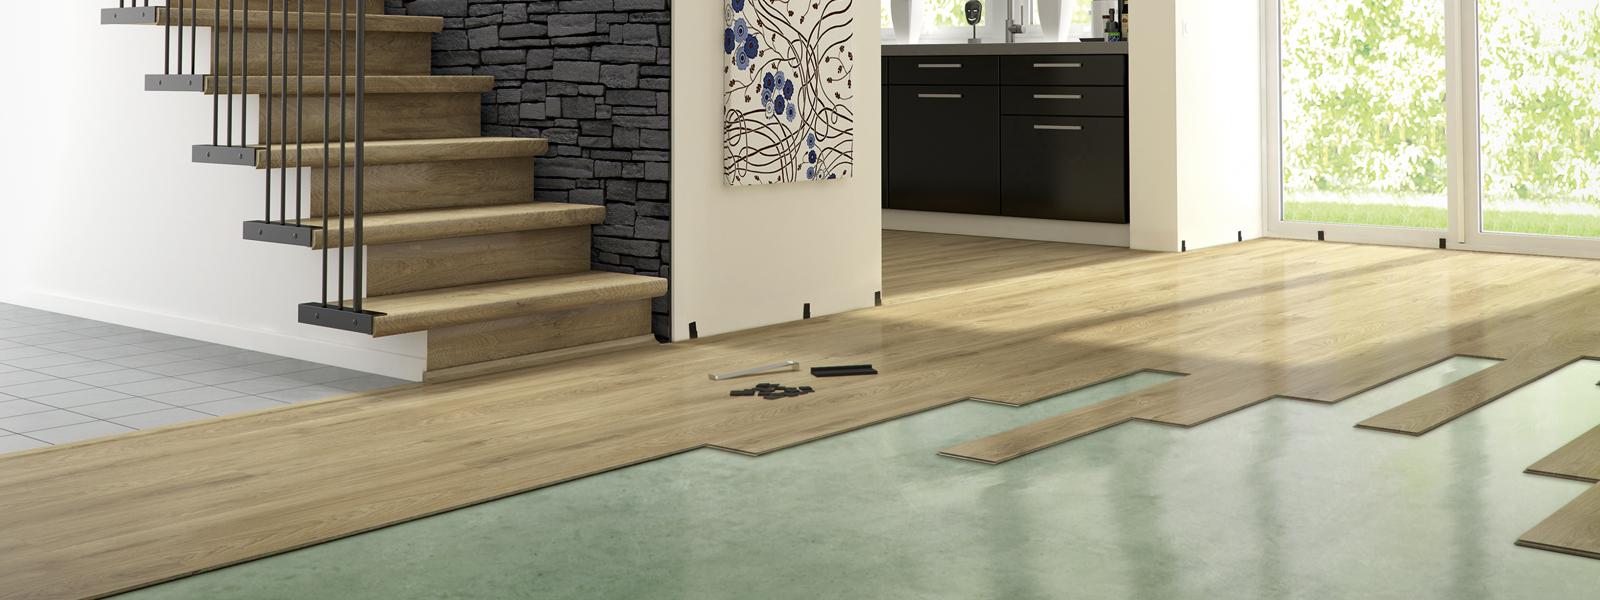 l1299 tilo parkett landhausdiele rustico trend eiche natur valley 4v fase strukturiert vital. Black Bedroom Furniture Sets. Home Design Ideas